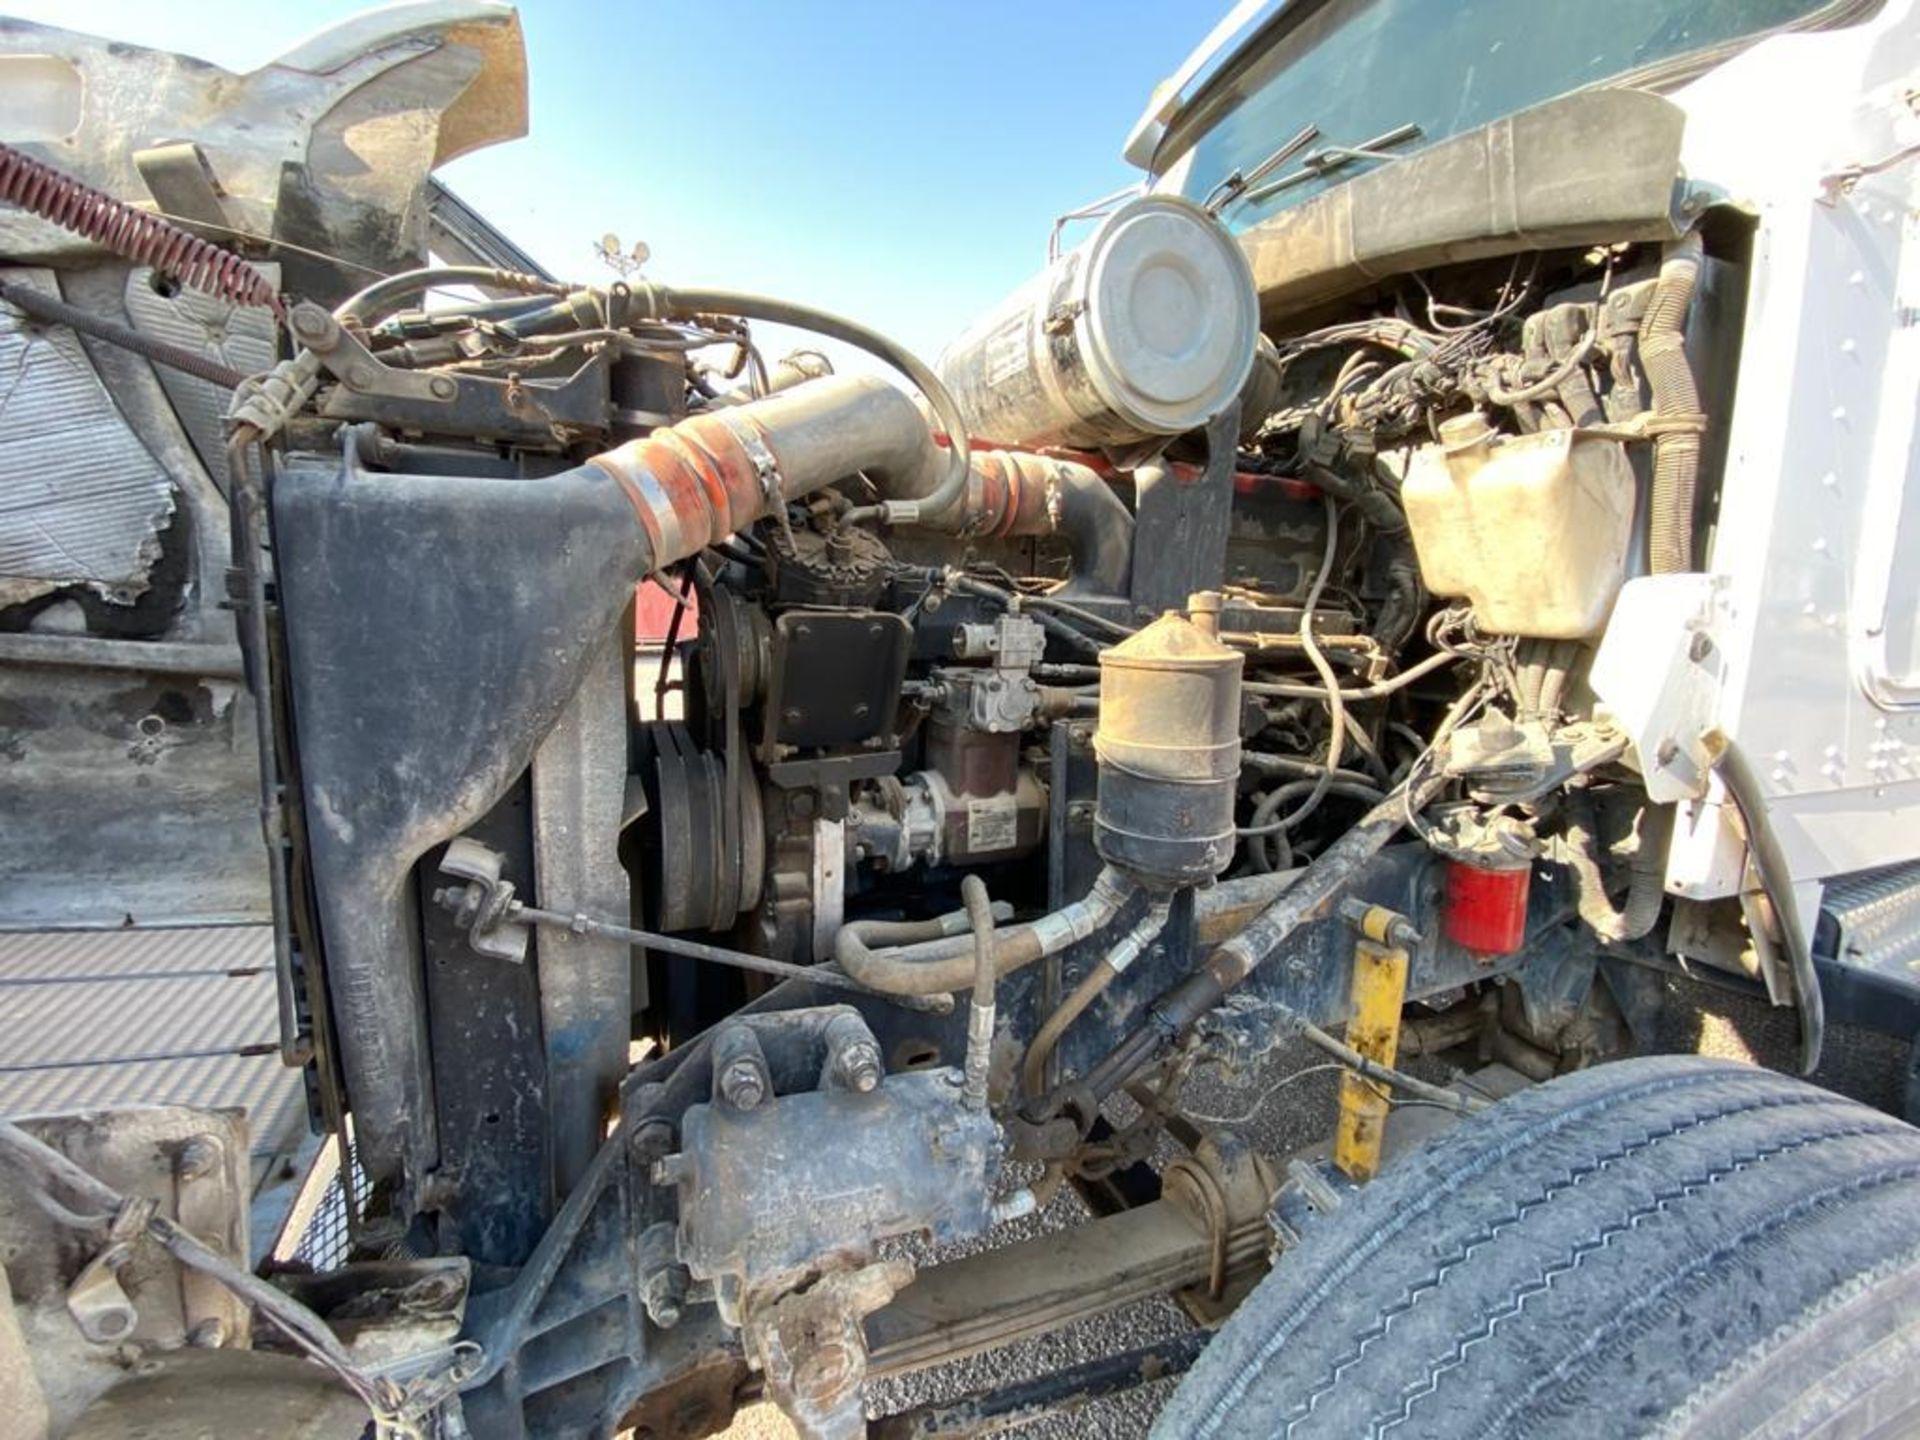 1998 Kenworth Sleeper Truck Tractor, standard transmission of 18 speeds - Image 44 of 55